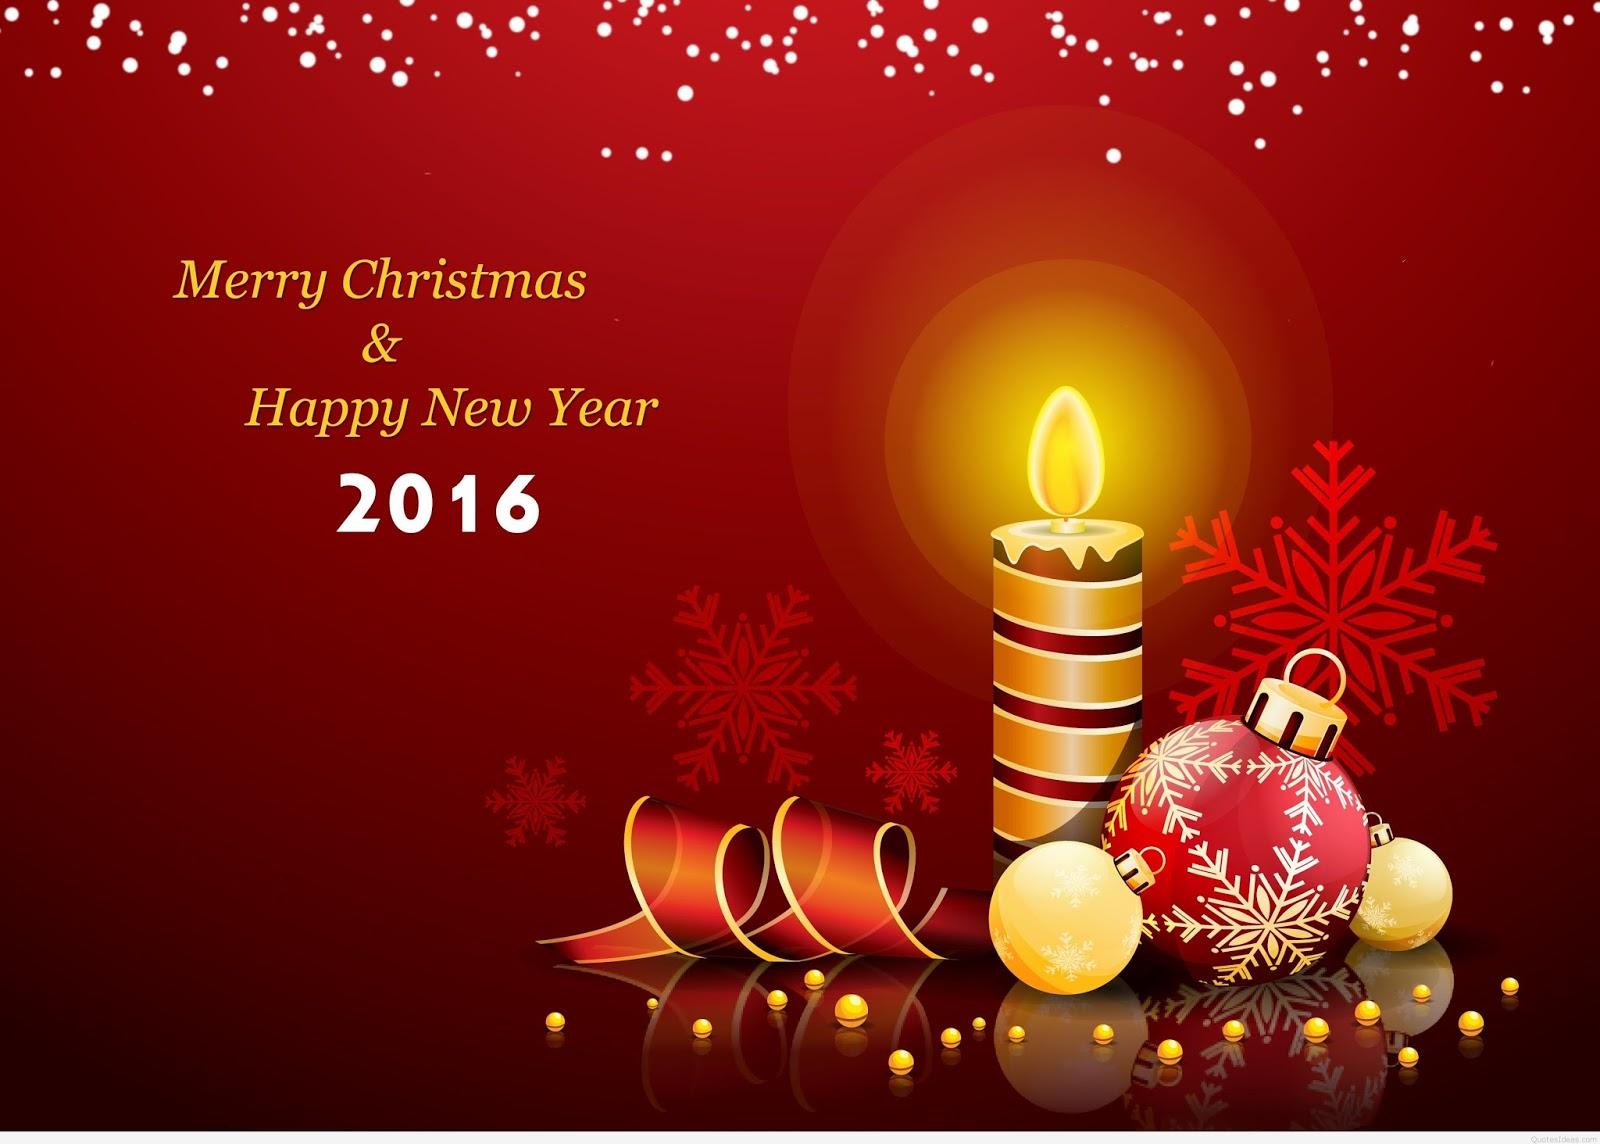 Gambar-DP-BBM-Selamat-Natal-dan-Tahun-Baru-2016-17